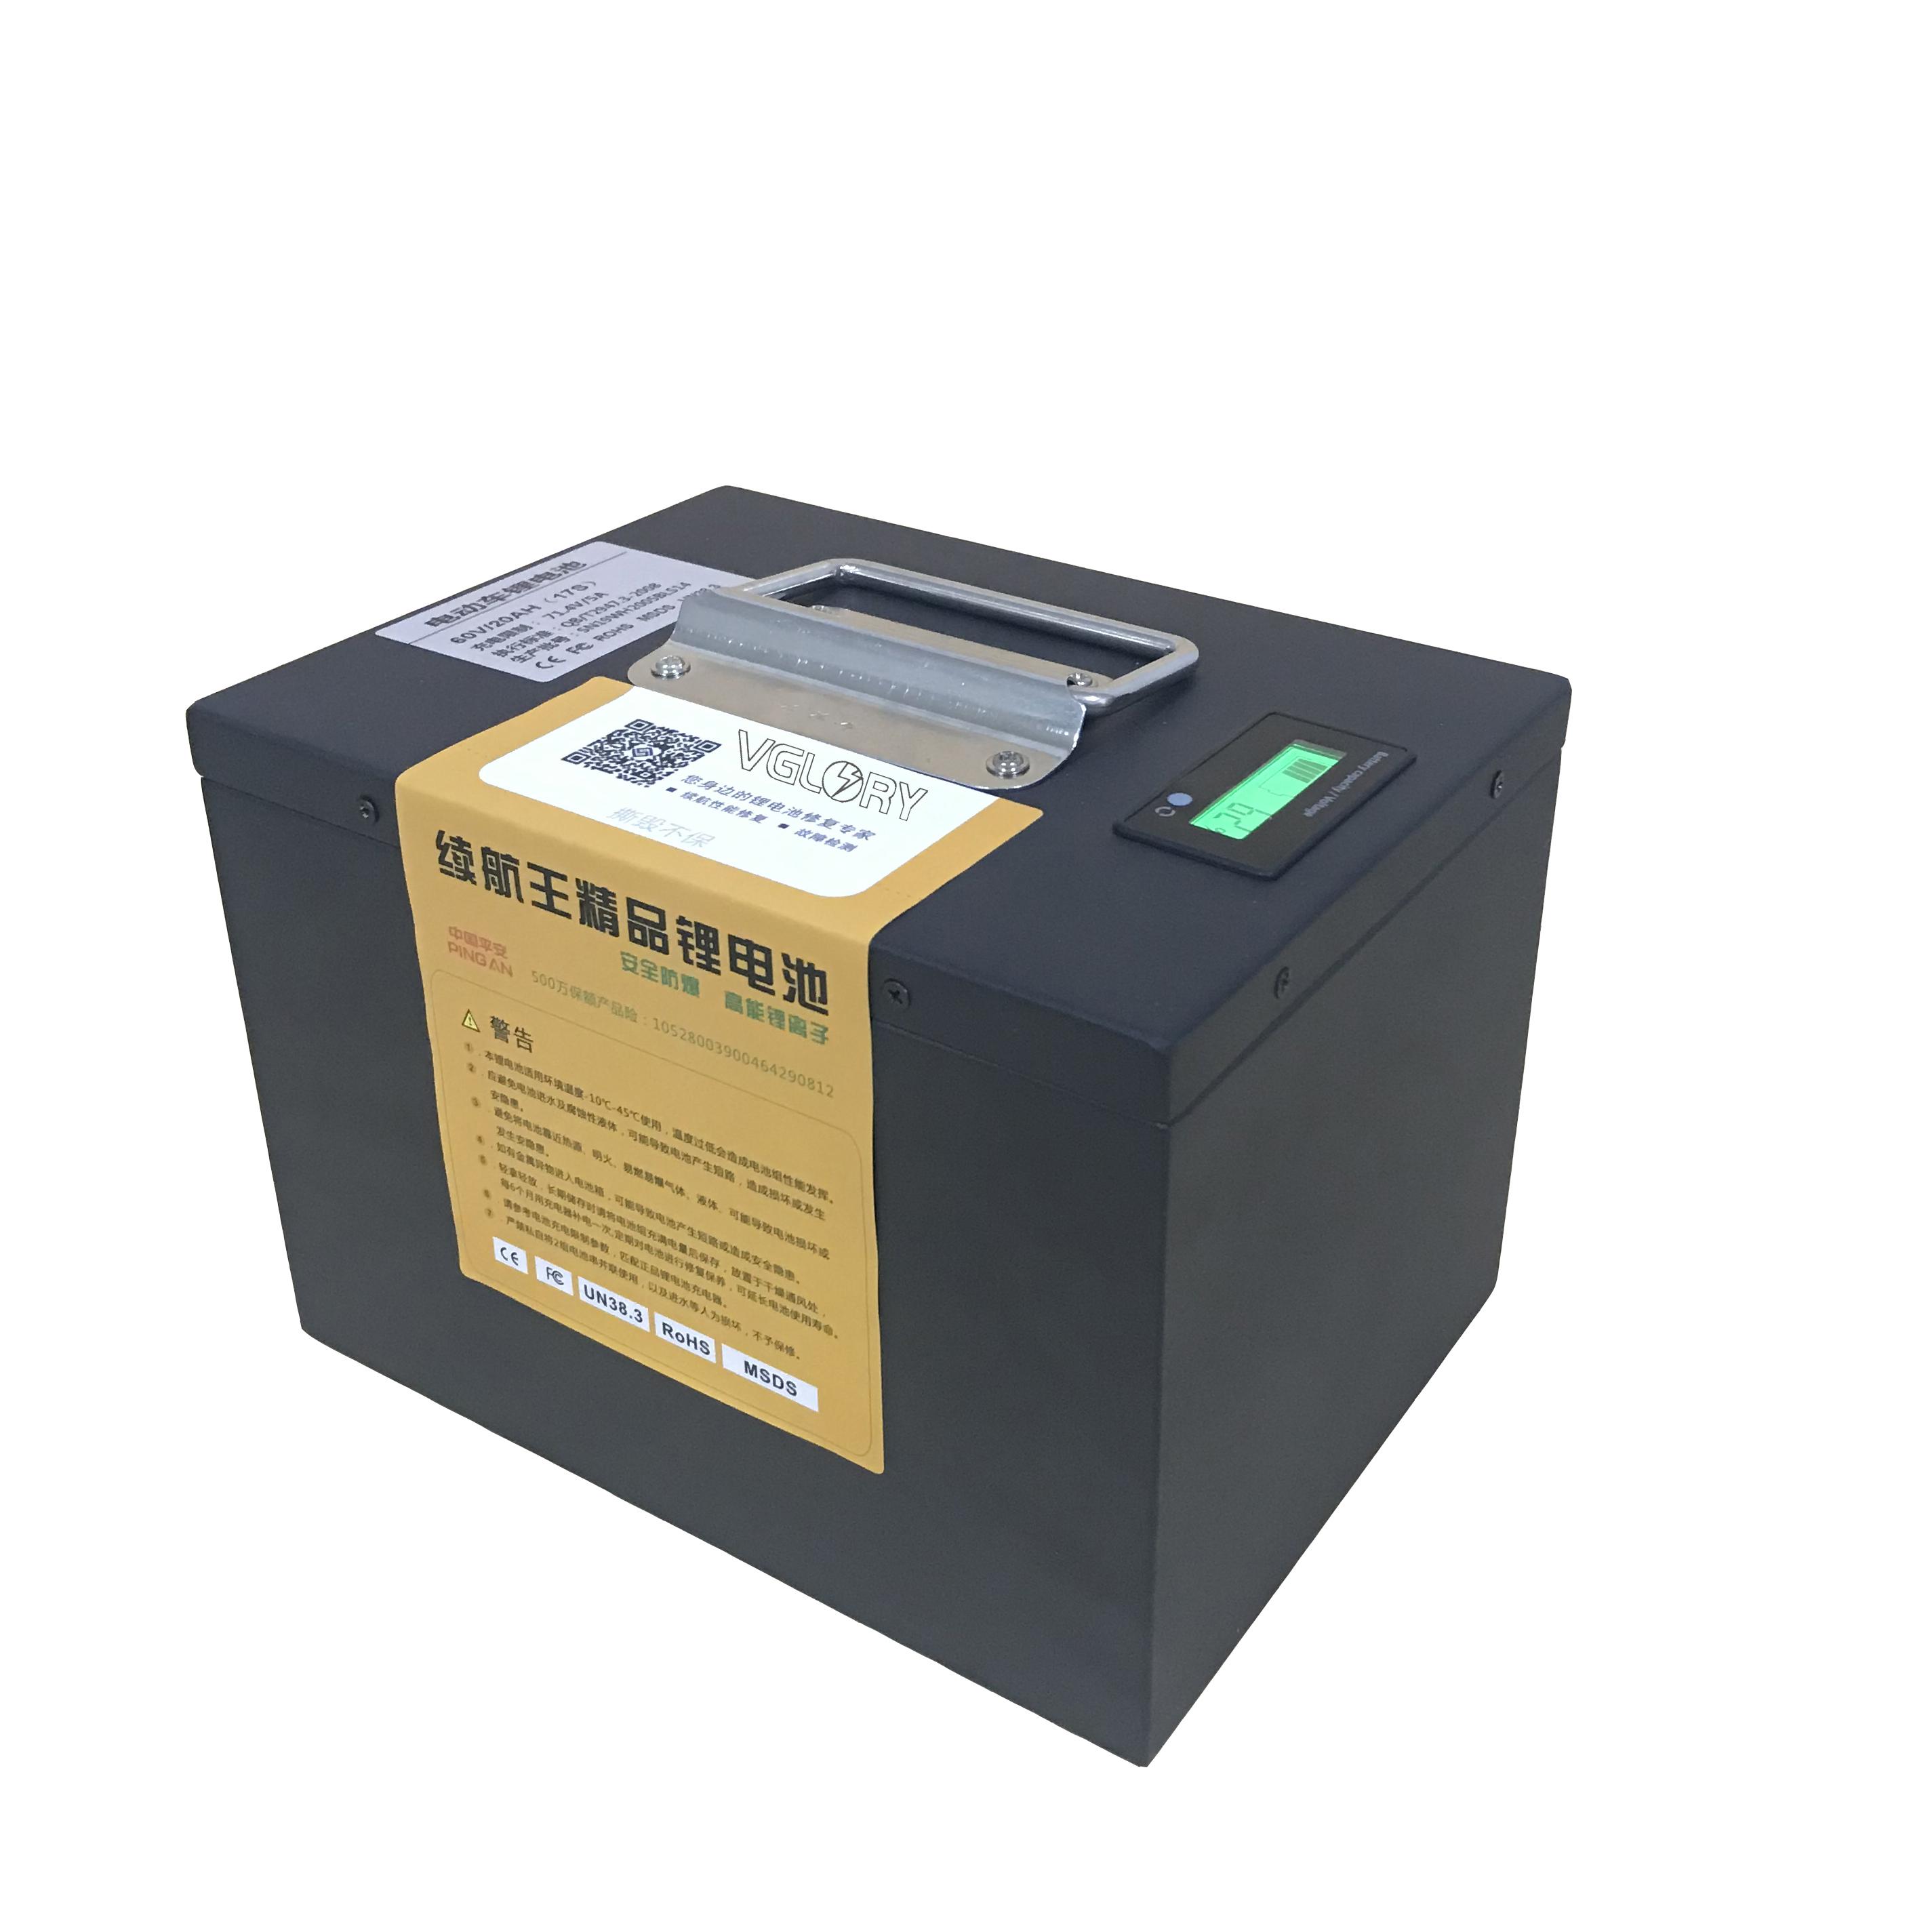 Run well under different temperature li-ion battery pack 12v 75ah 50ah